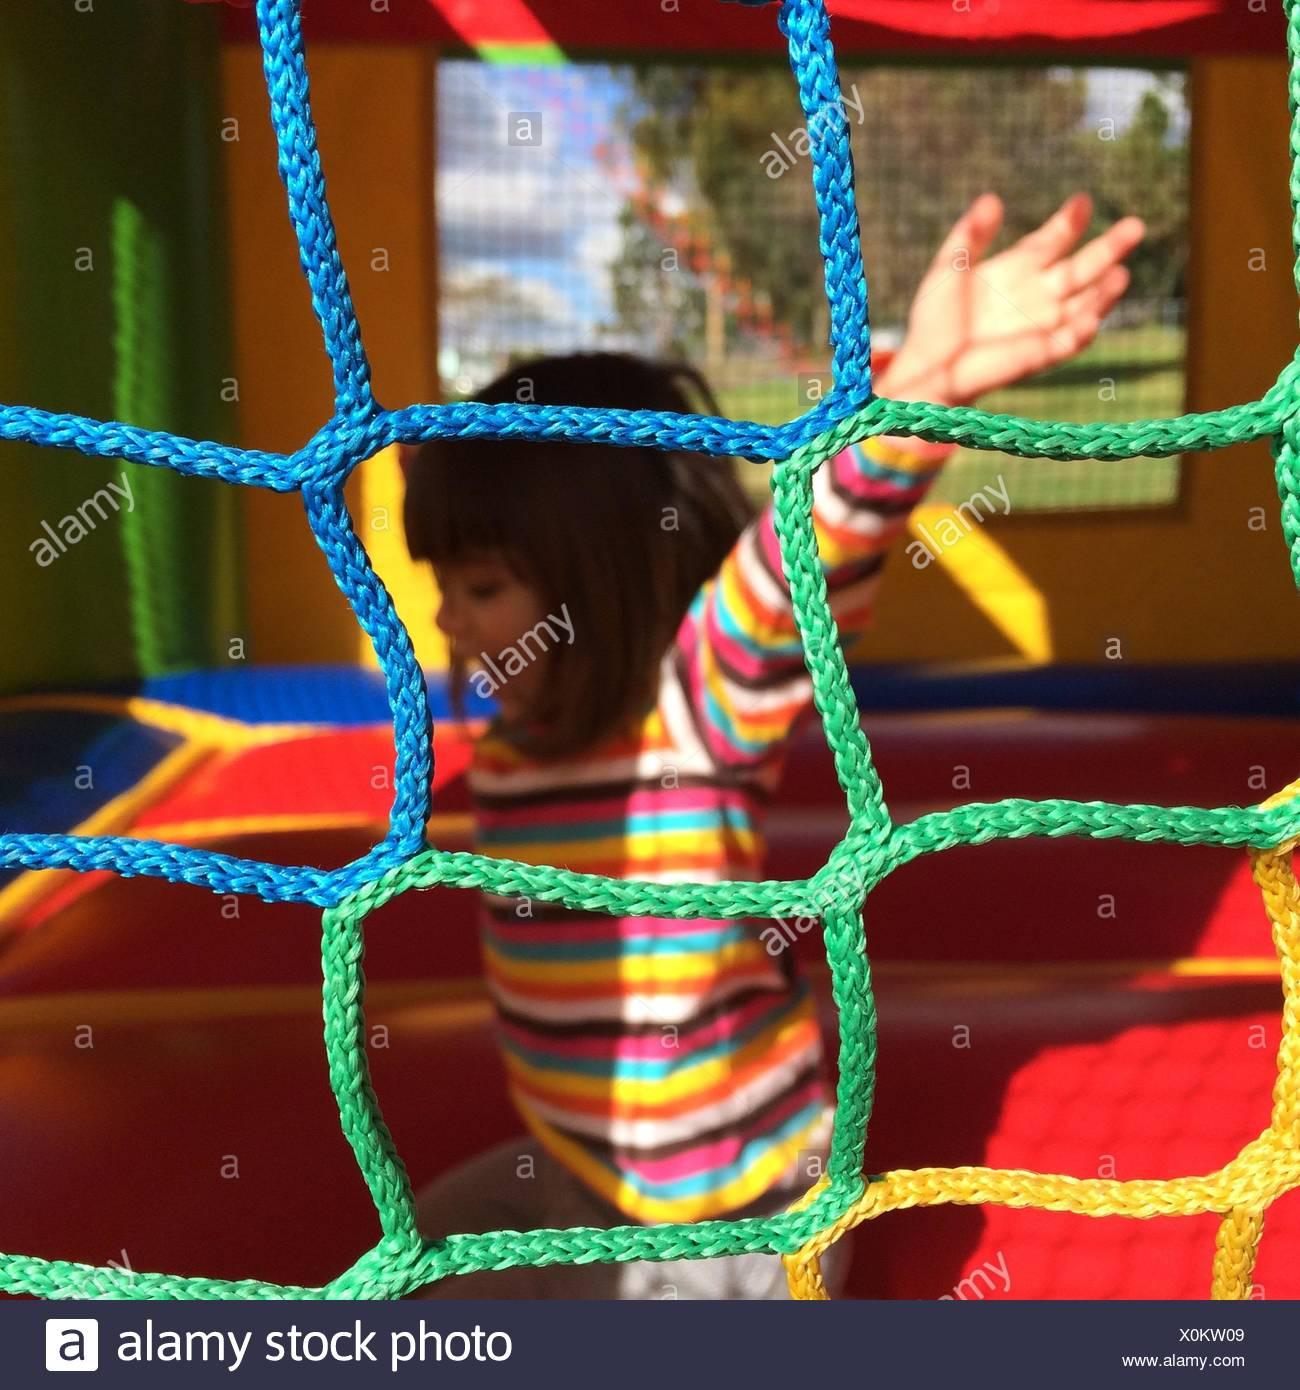 Girl Having Fun In Playground - Stock Image